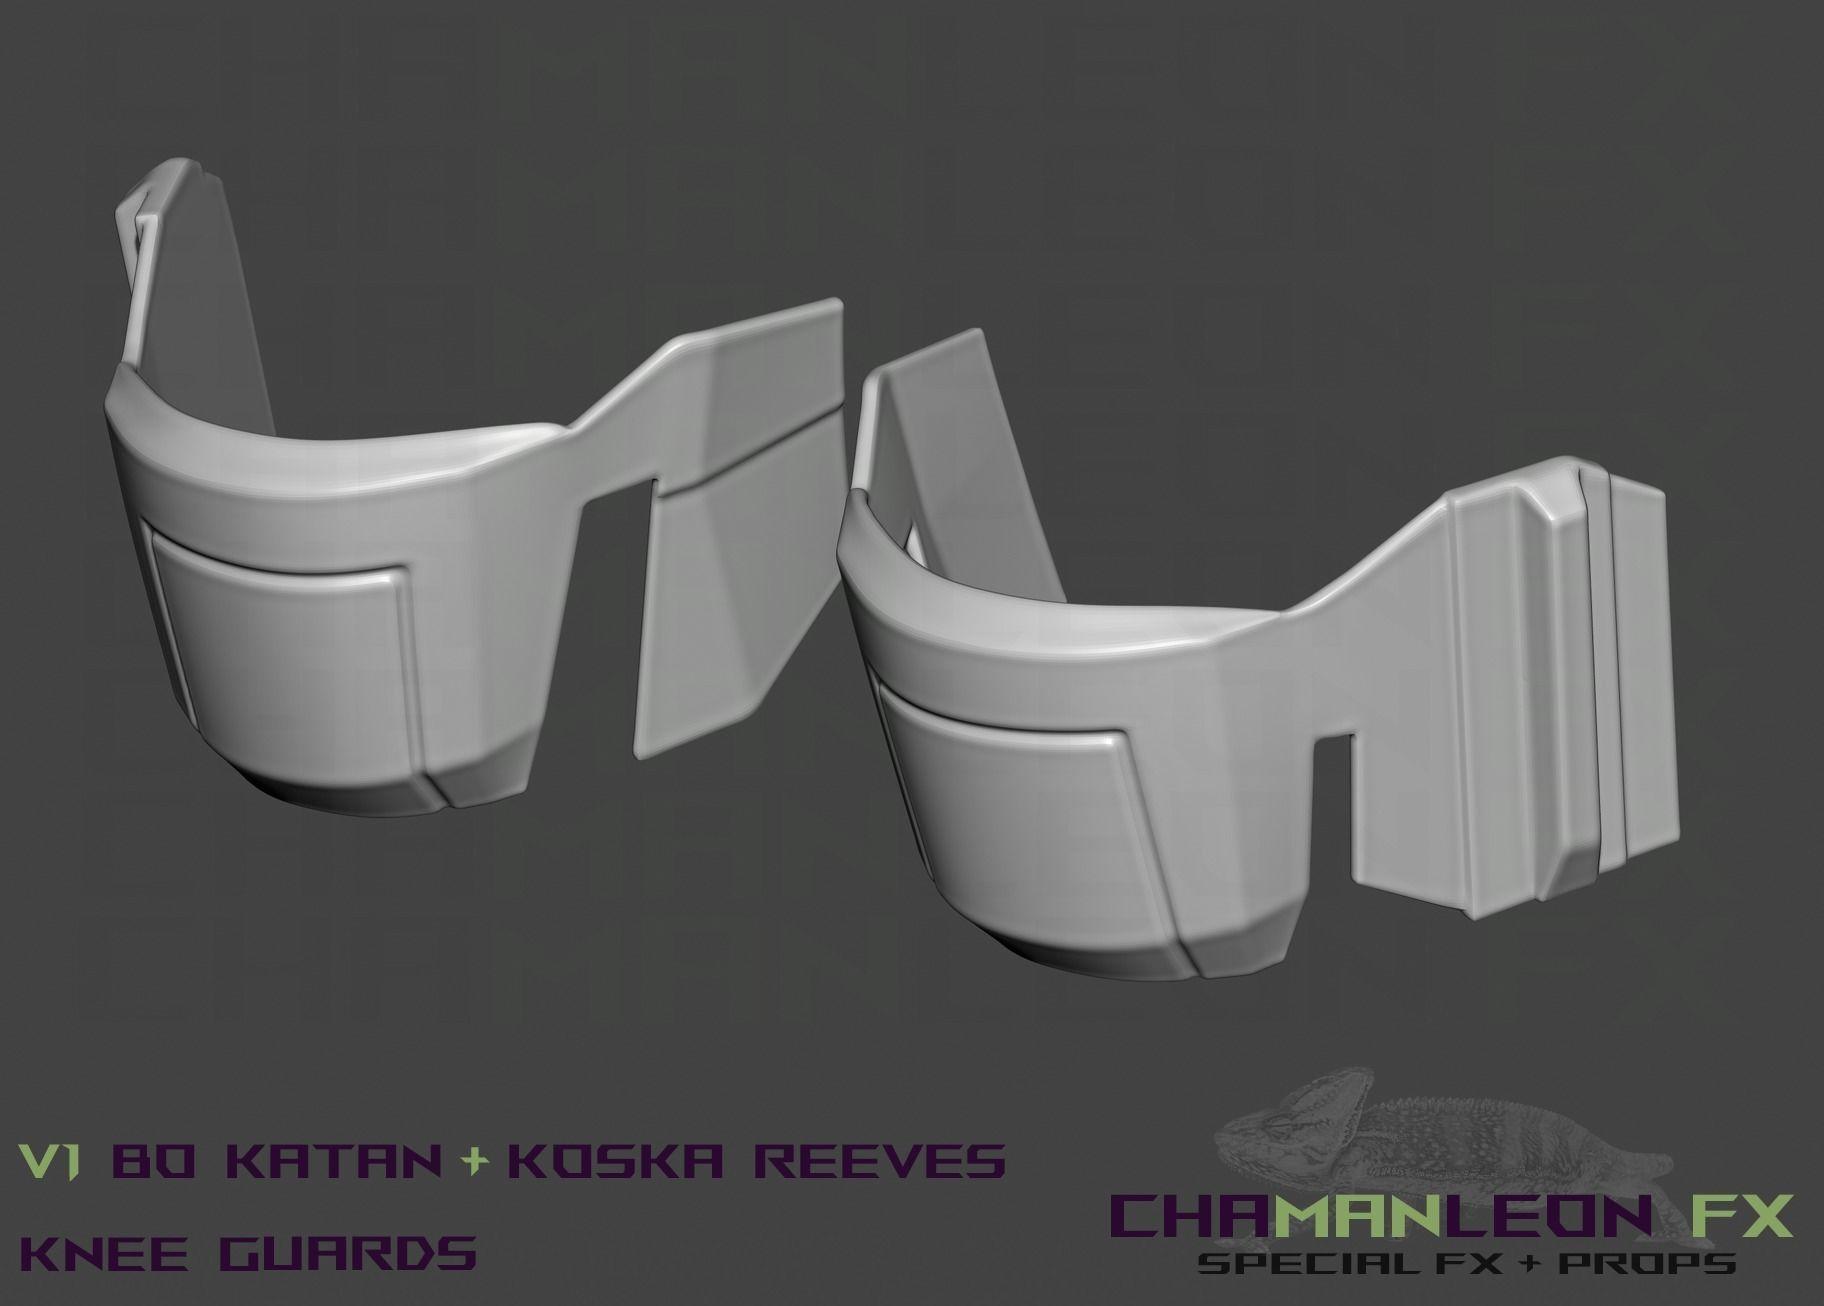 Bo Katan and Koska Reeves Cosplay Knee Guards The Mandalorian